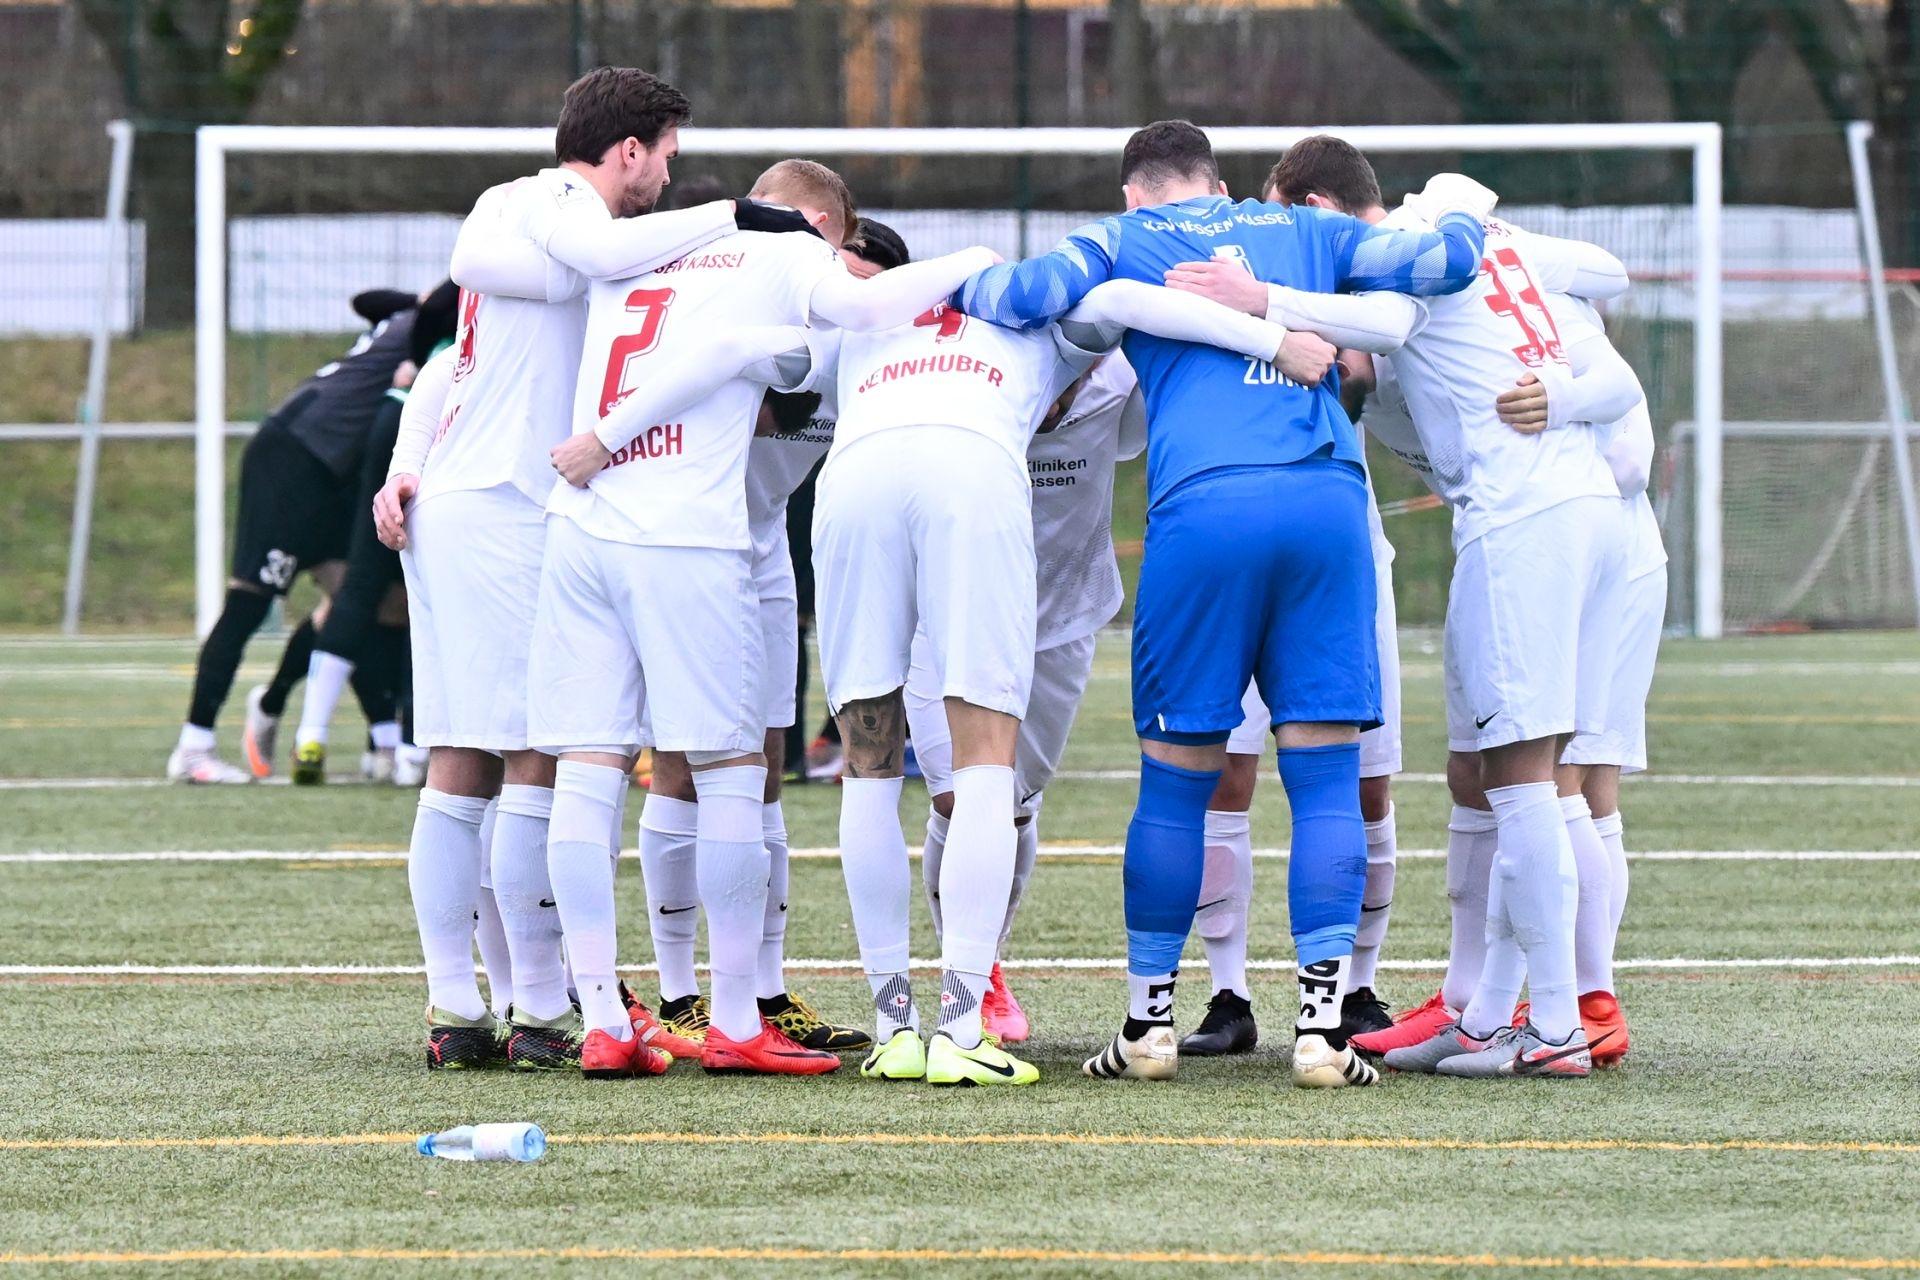 Regionalliga Südwest 2020/21, KSVHessen Kassel, FC Gießen, Endstand 1:1, Mannschaftskreis